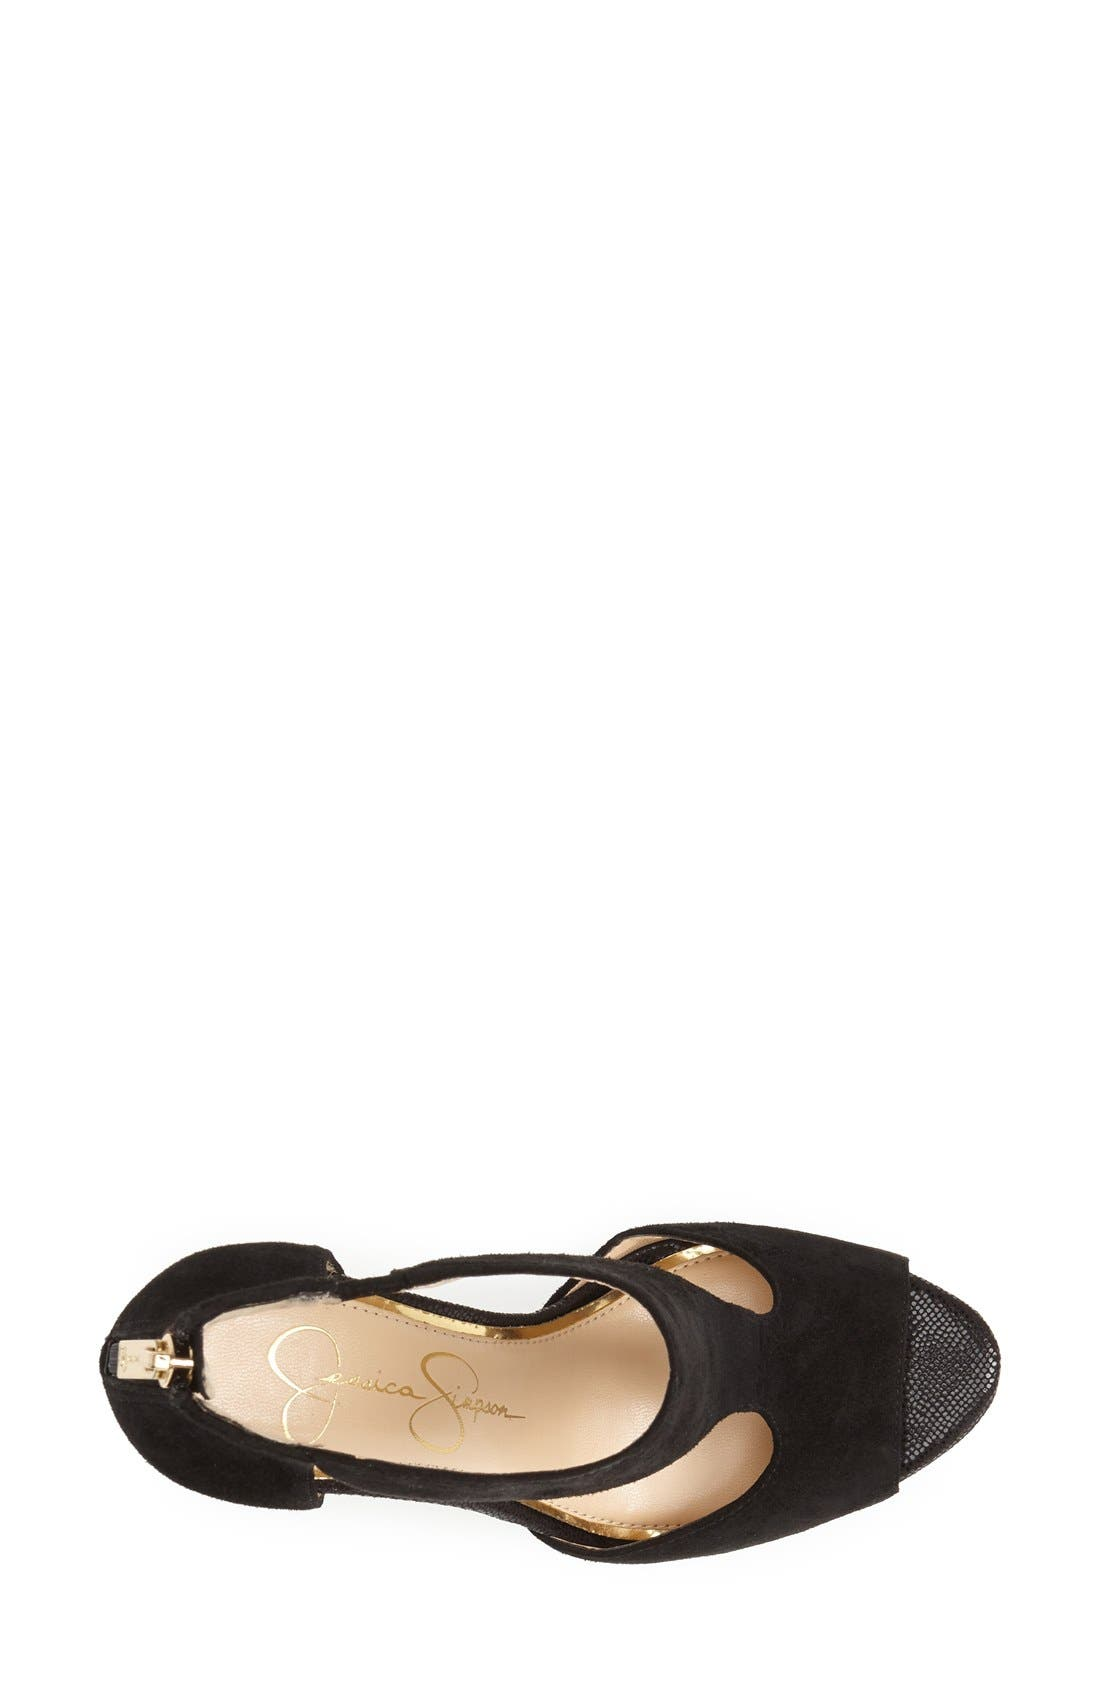 Alternate Image 3  - Jessica Simpson 'Carideo' Platform Sandal (Women)